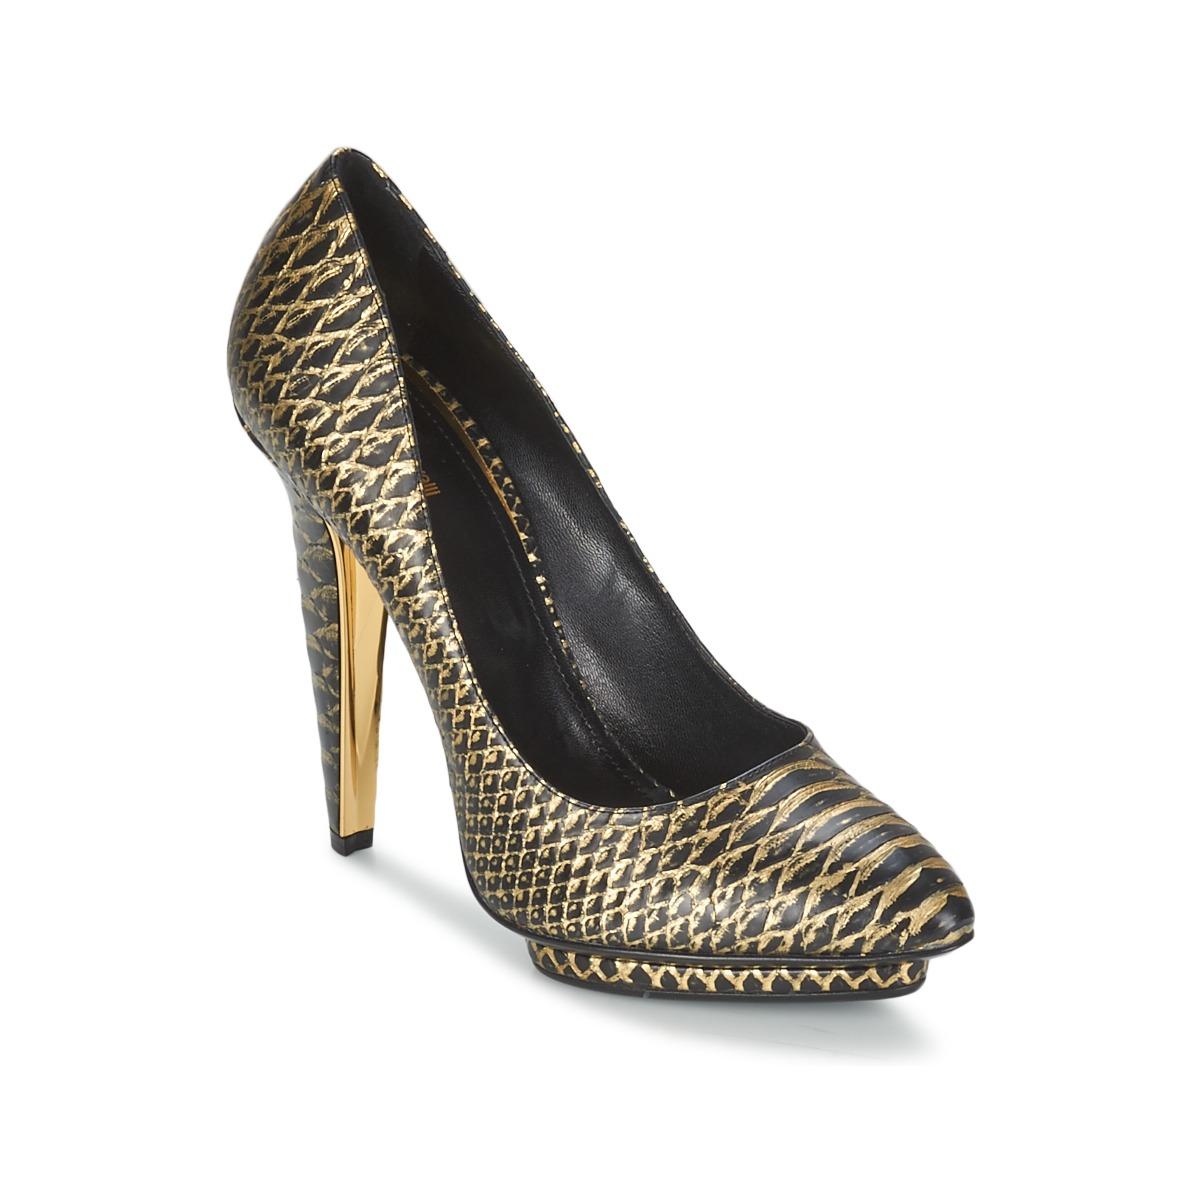 Court-shoes Roberto Cavalli YDS622-UC168-D0007 Black / GOLD